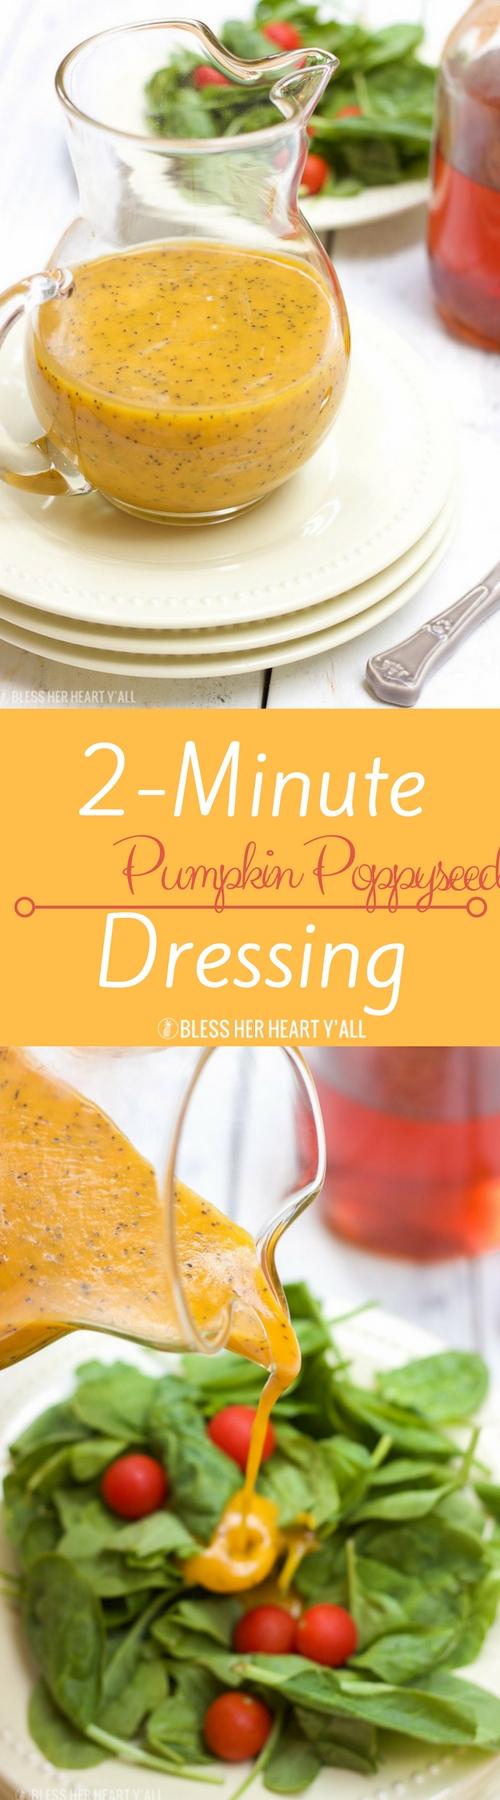 Pumpkin Poppyseed Dressing